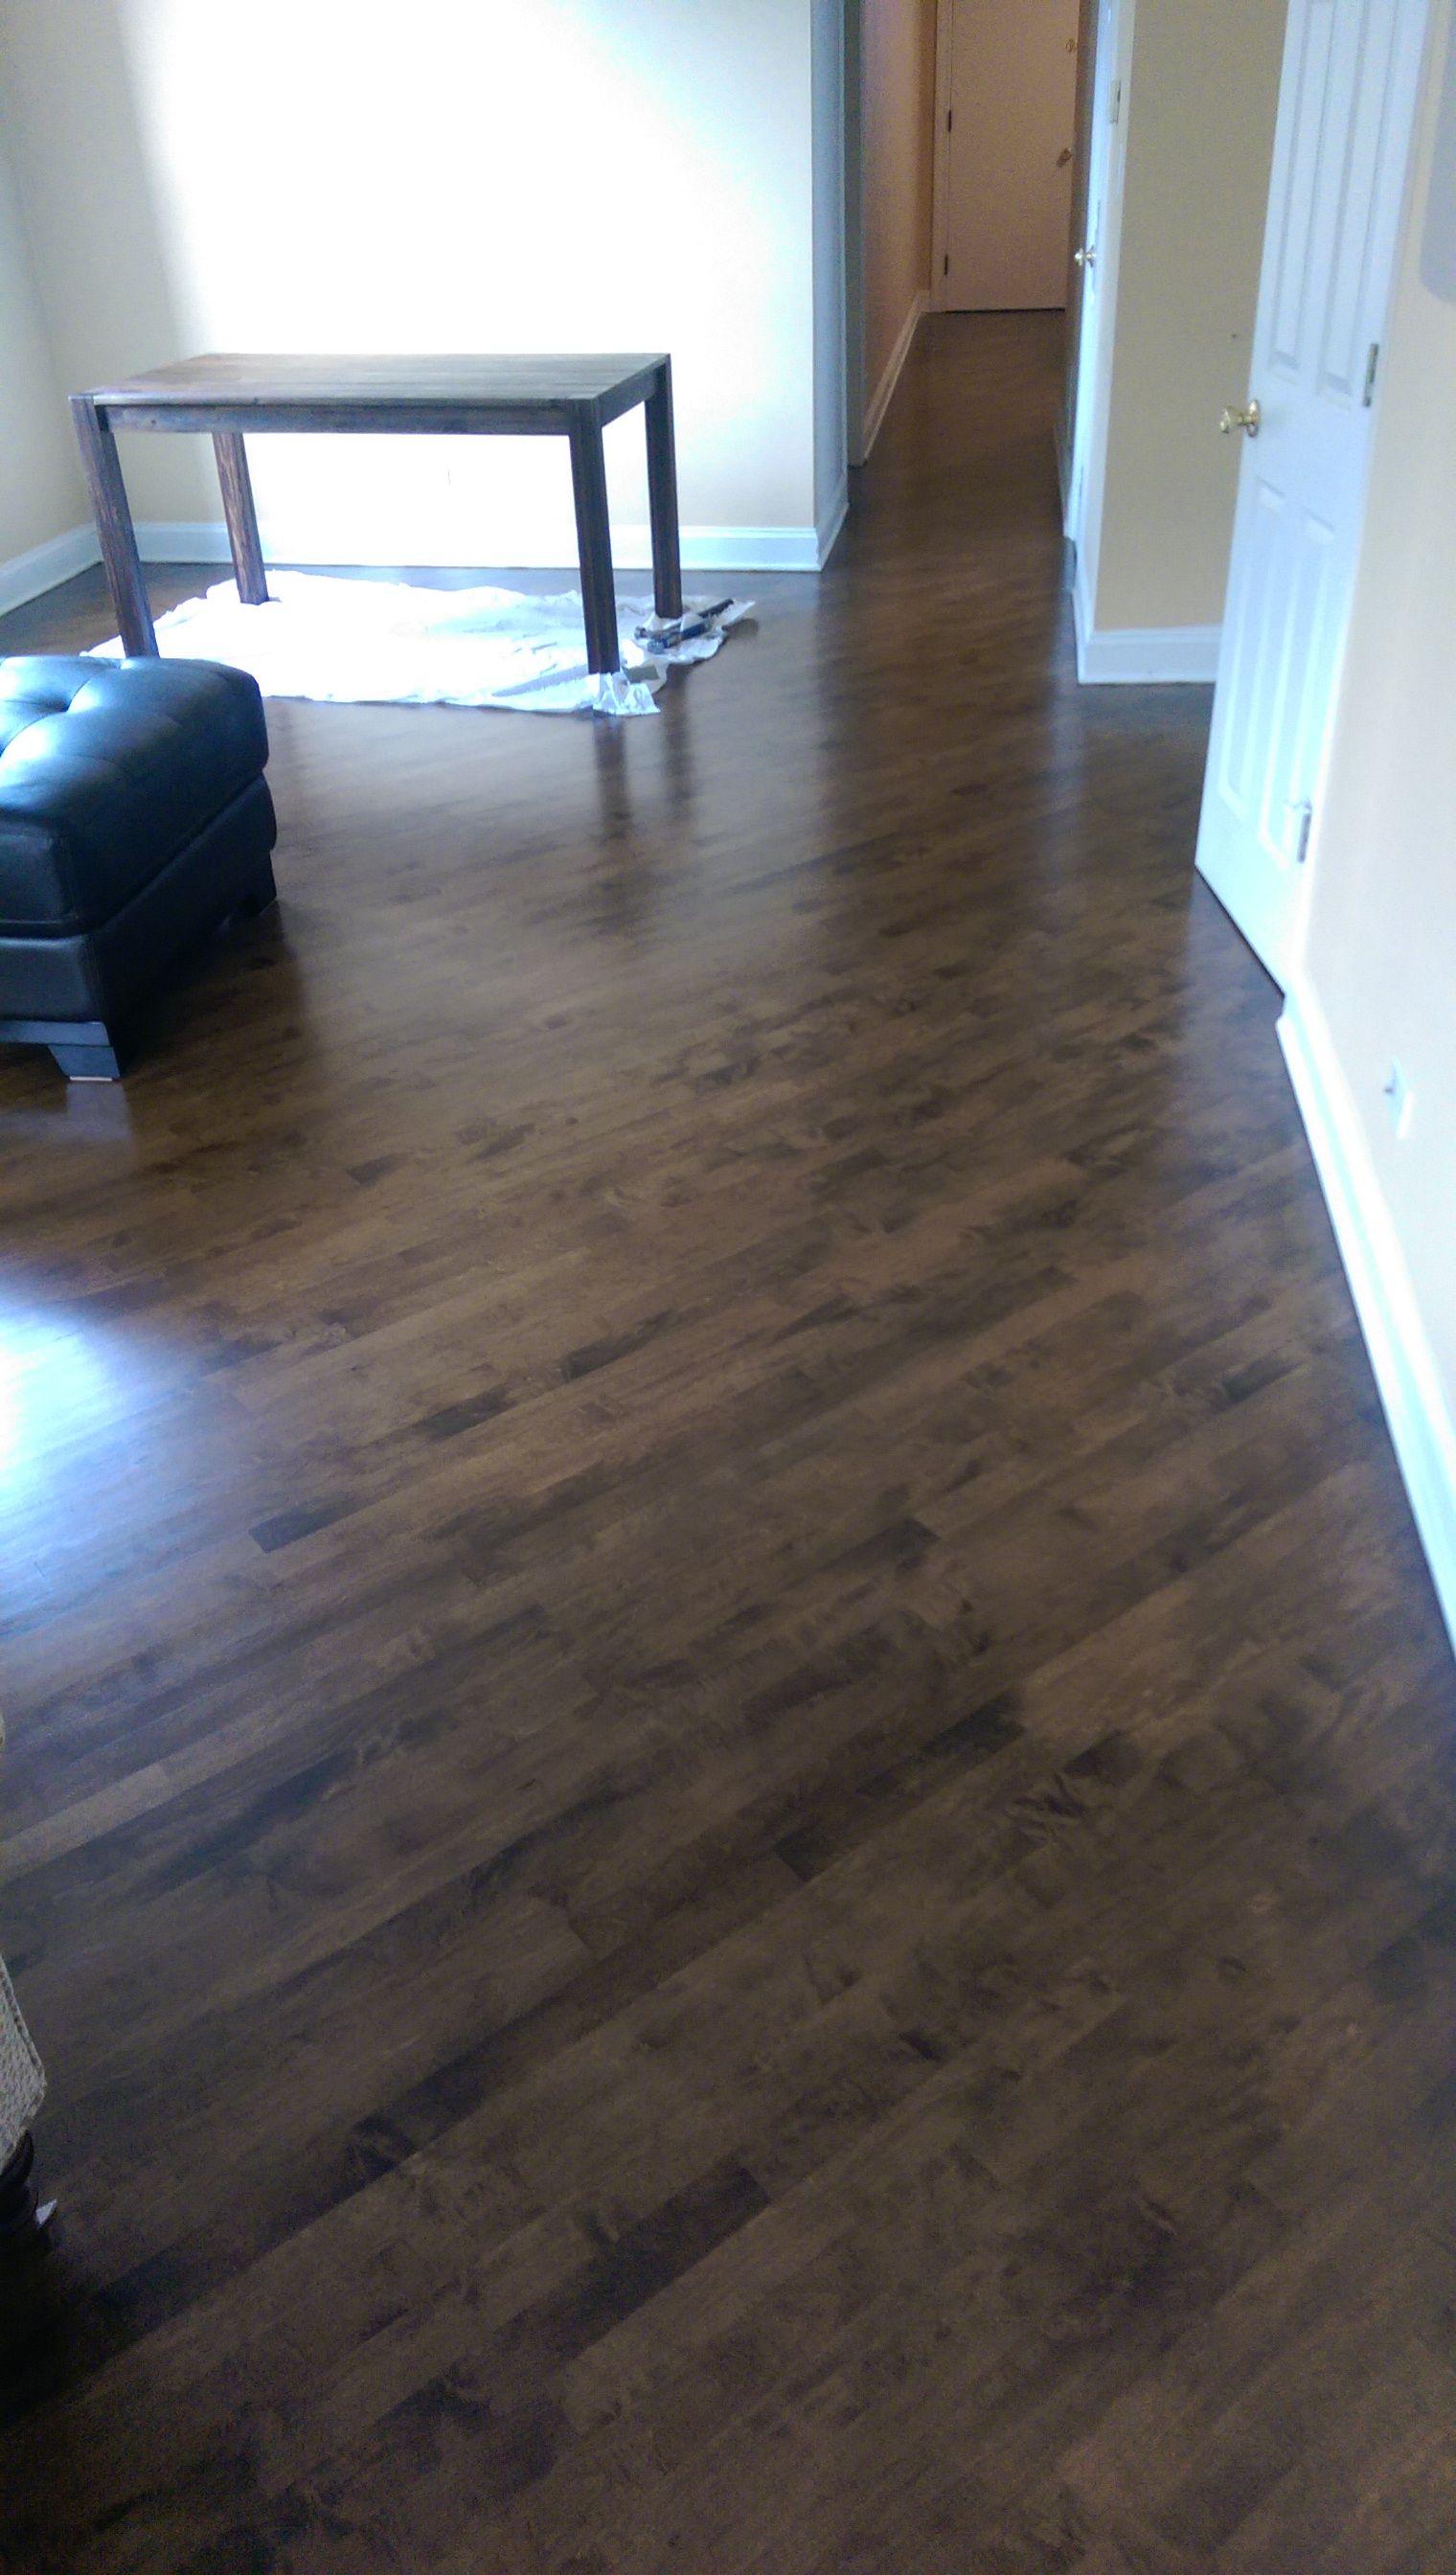 Antique Brown Stain Satin Polyurethane Maple Wood Flooring